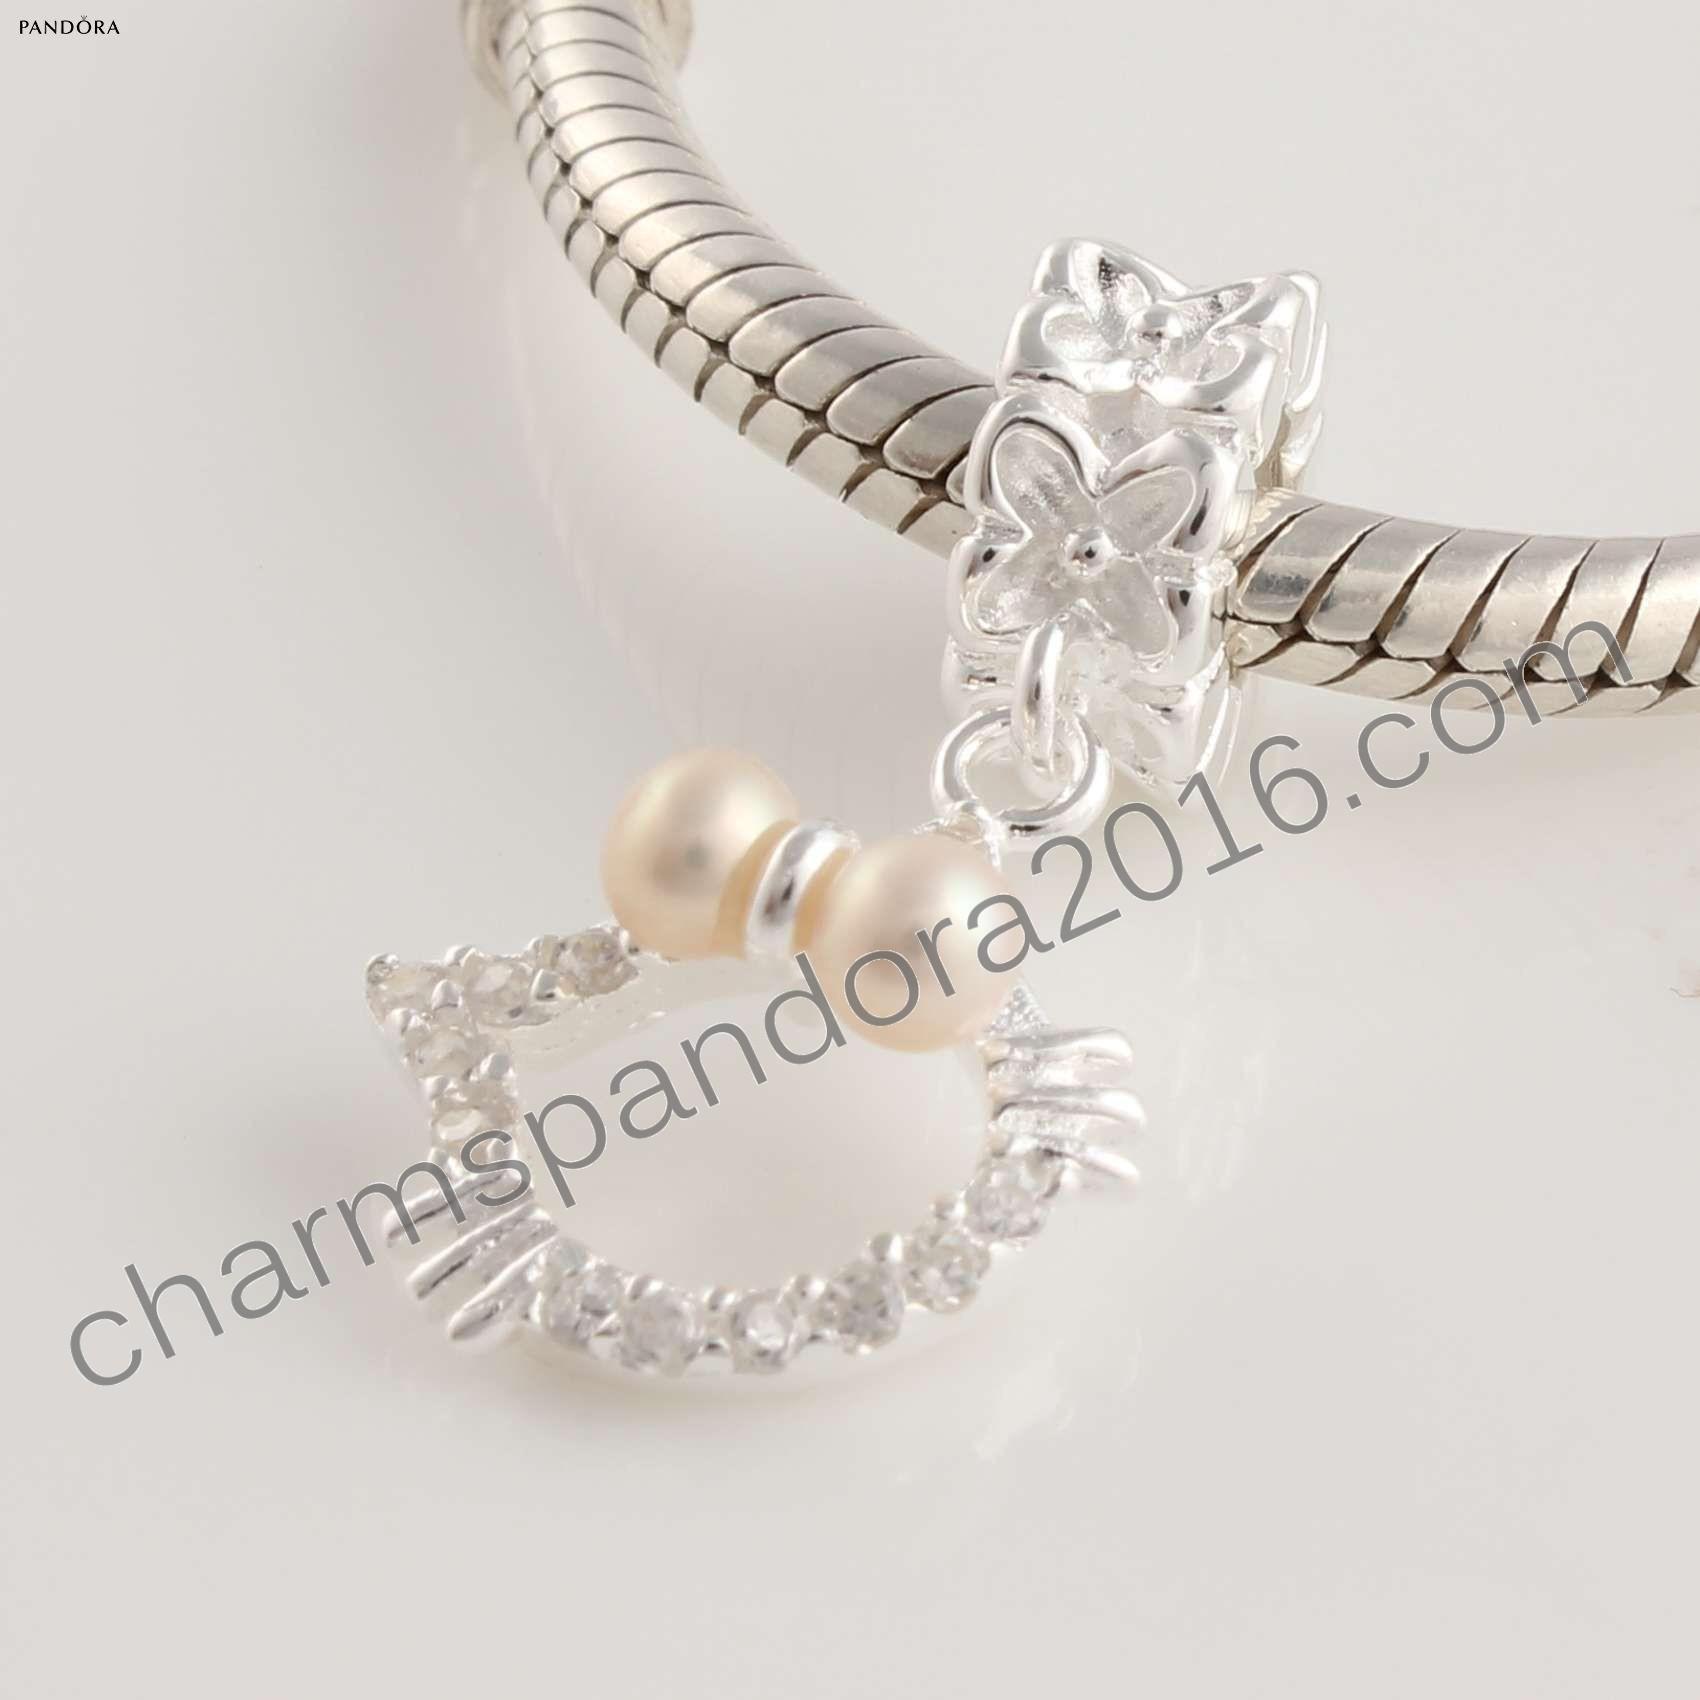 pandora charms pas cher